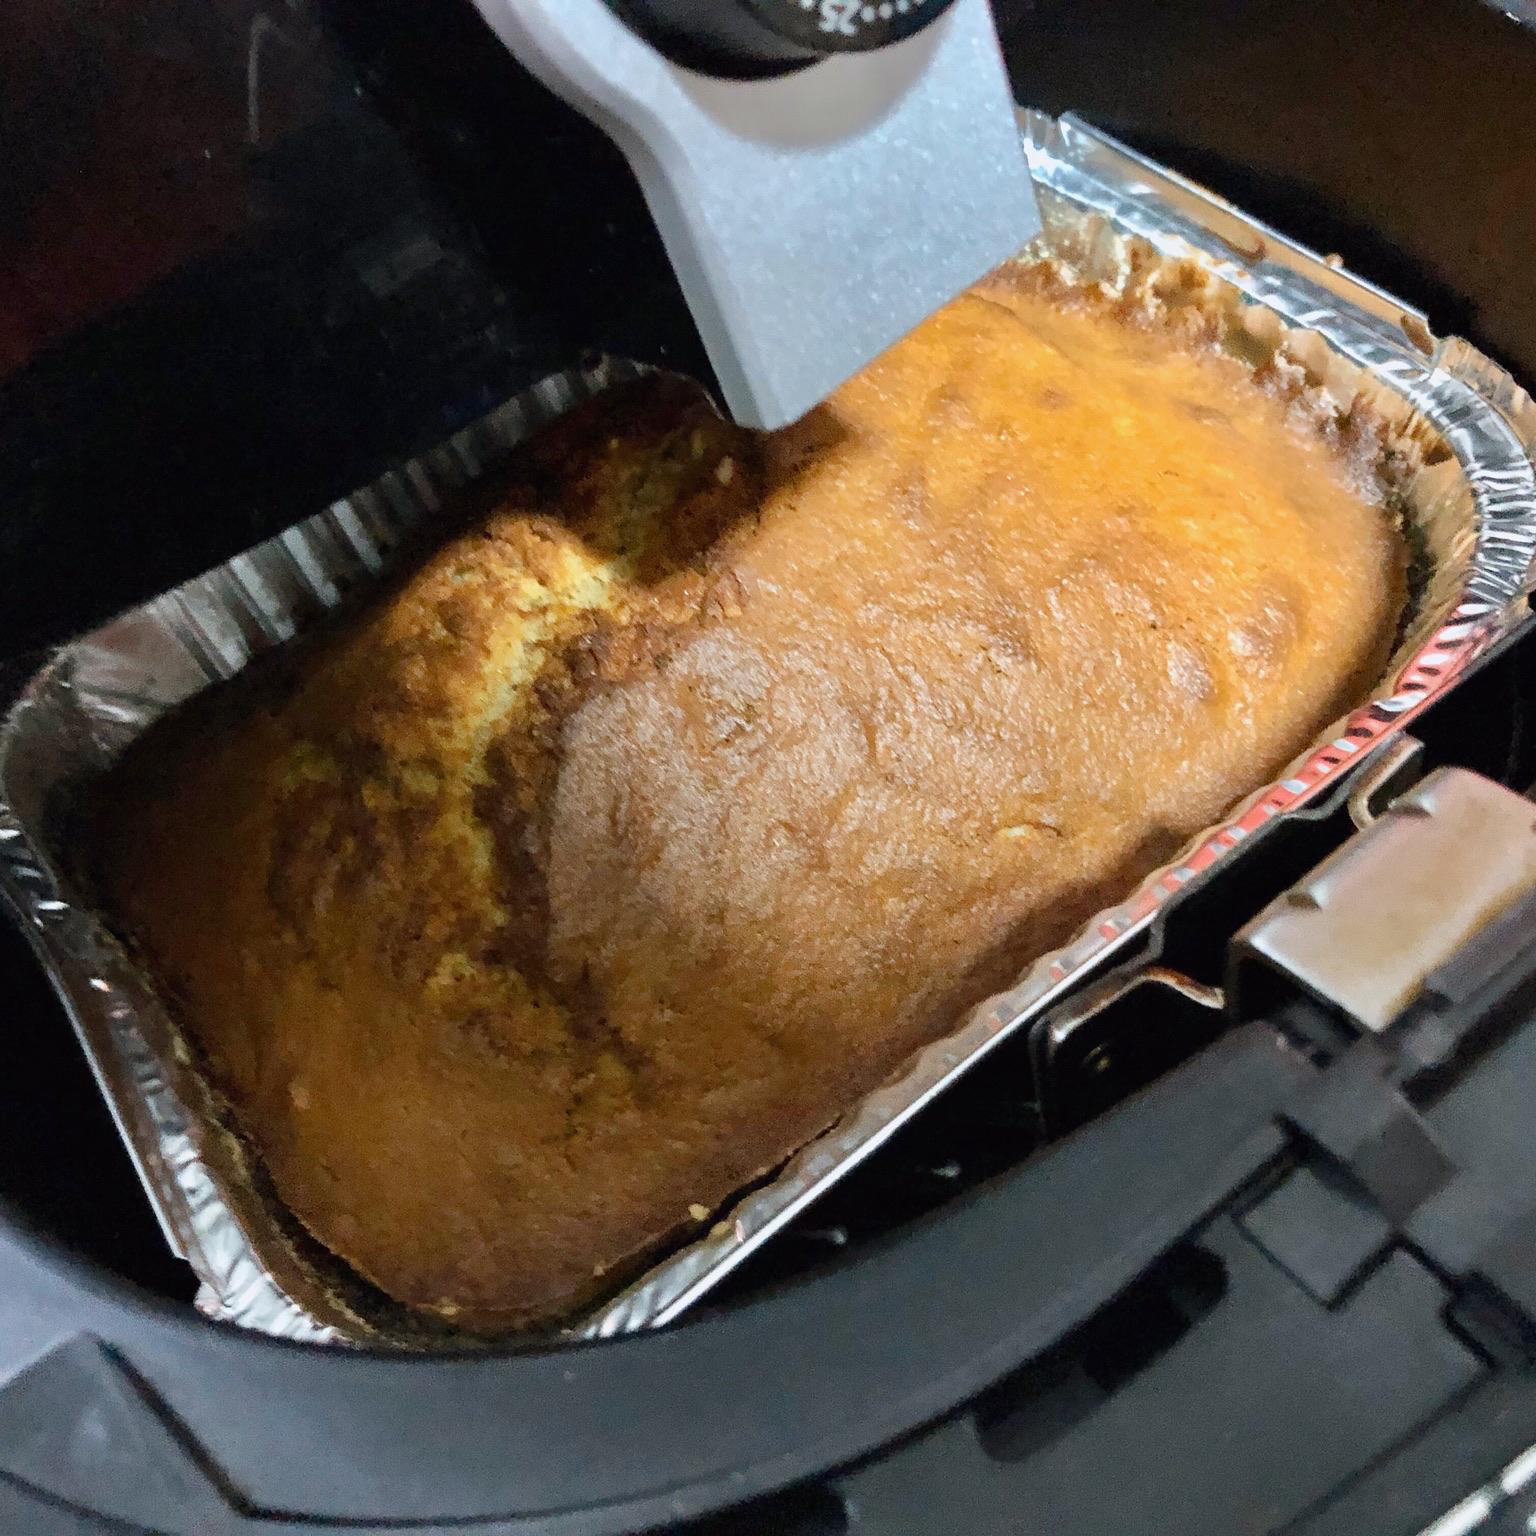 A-Number-1 Banana Cake